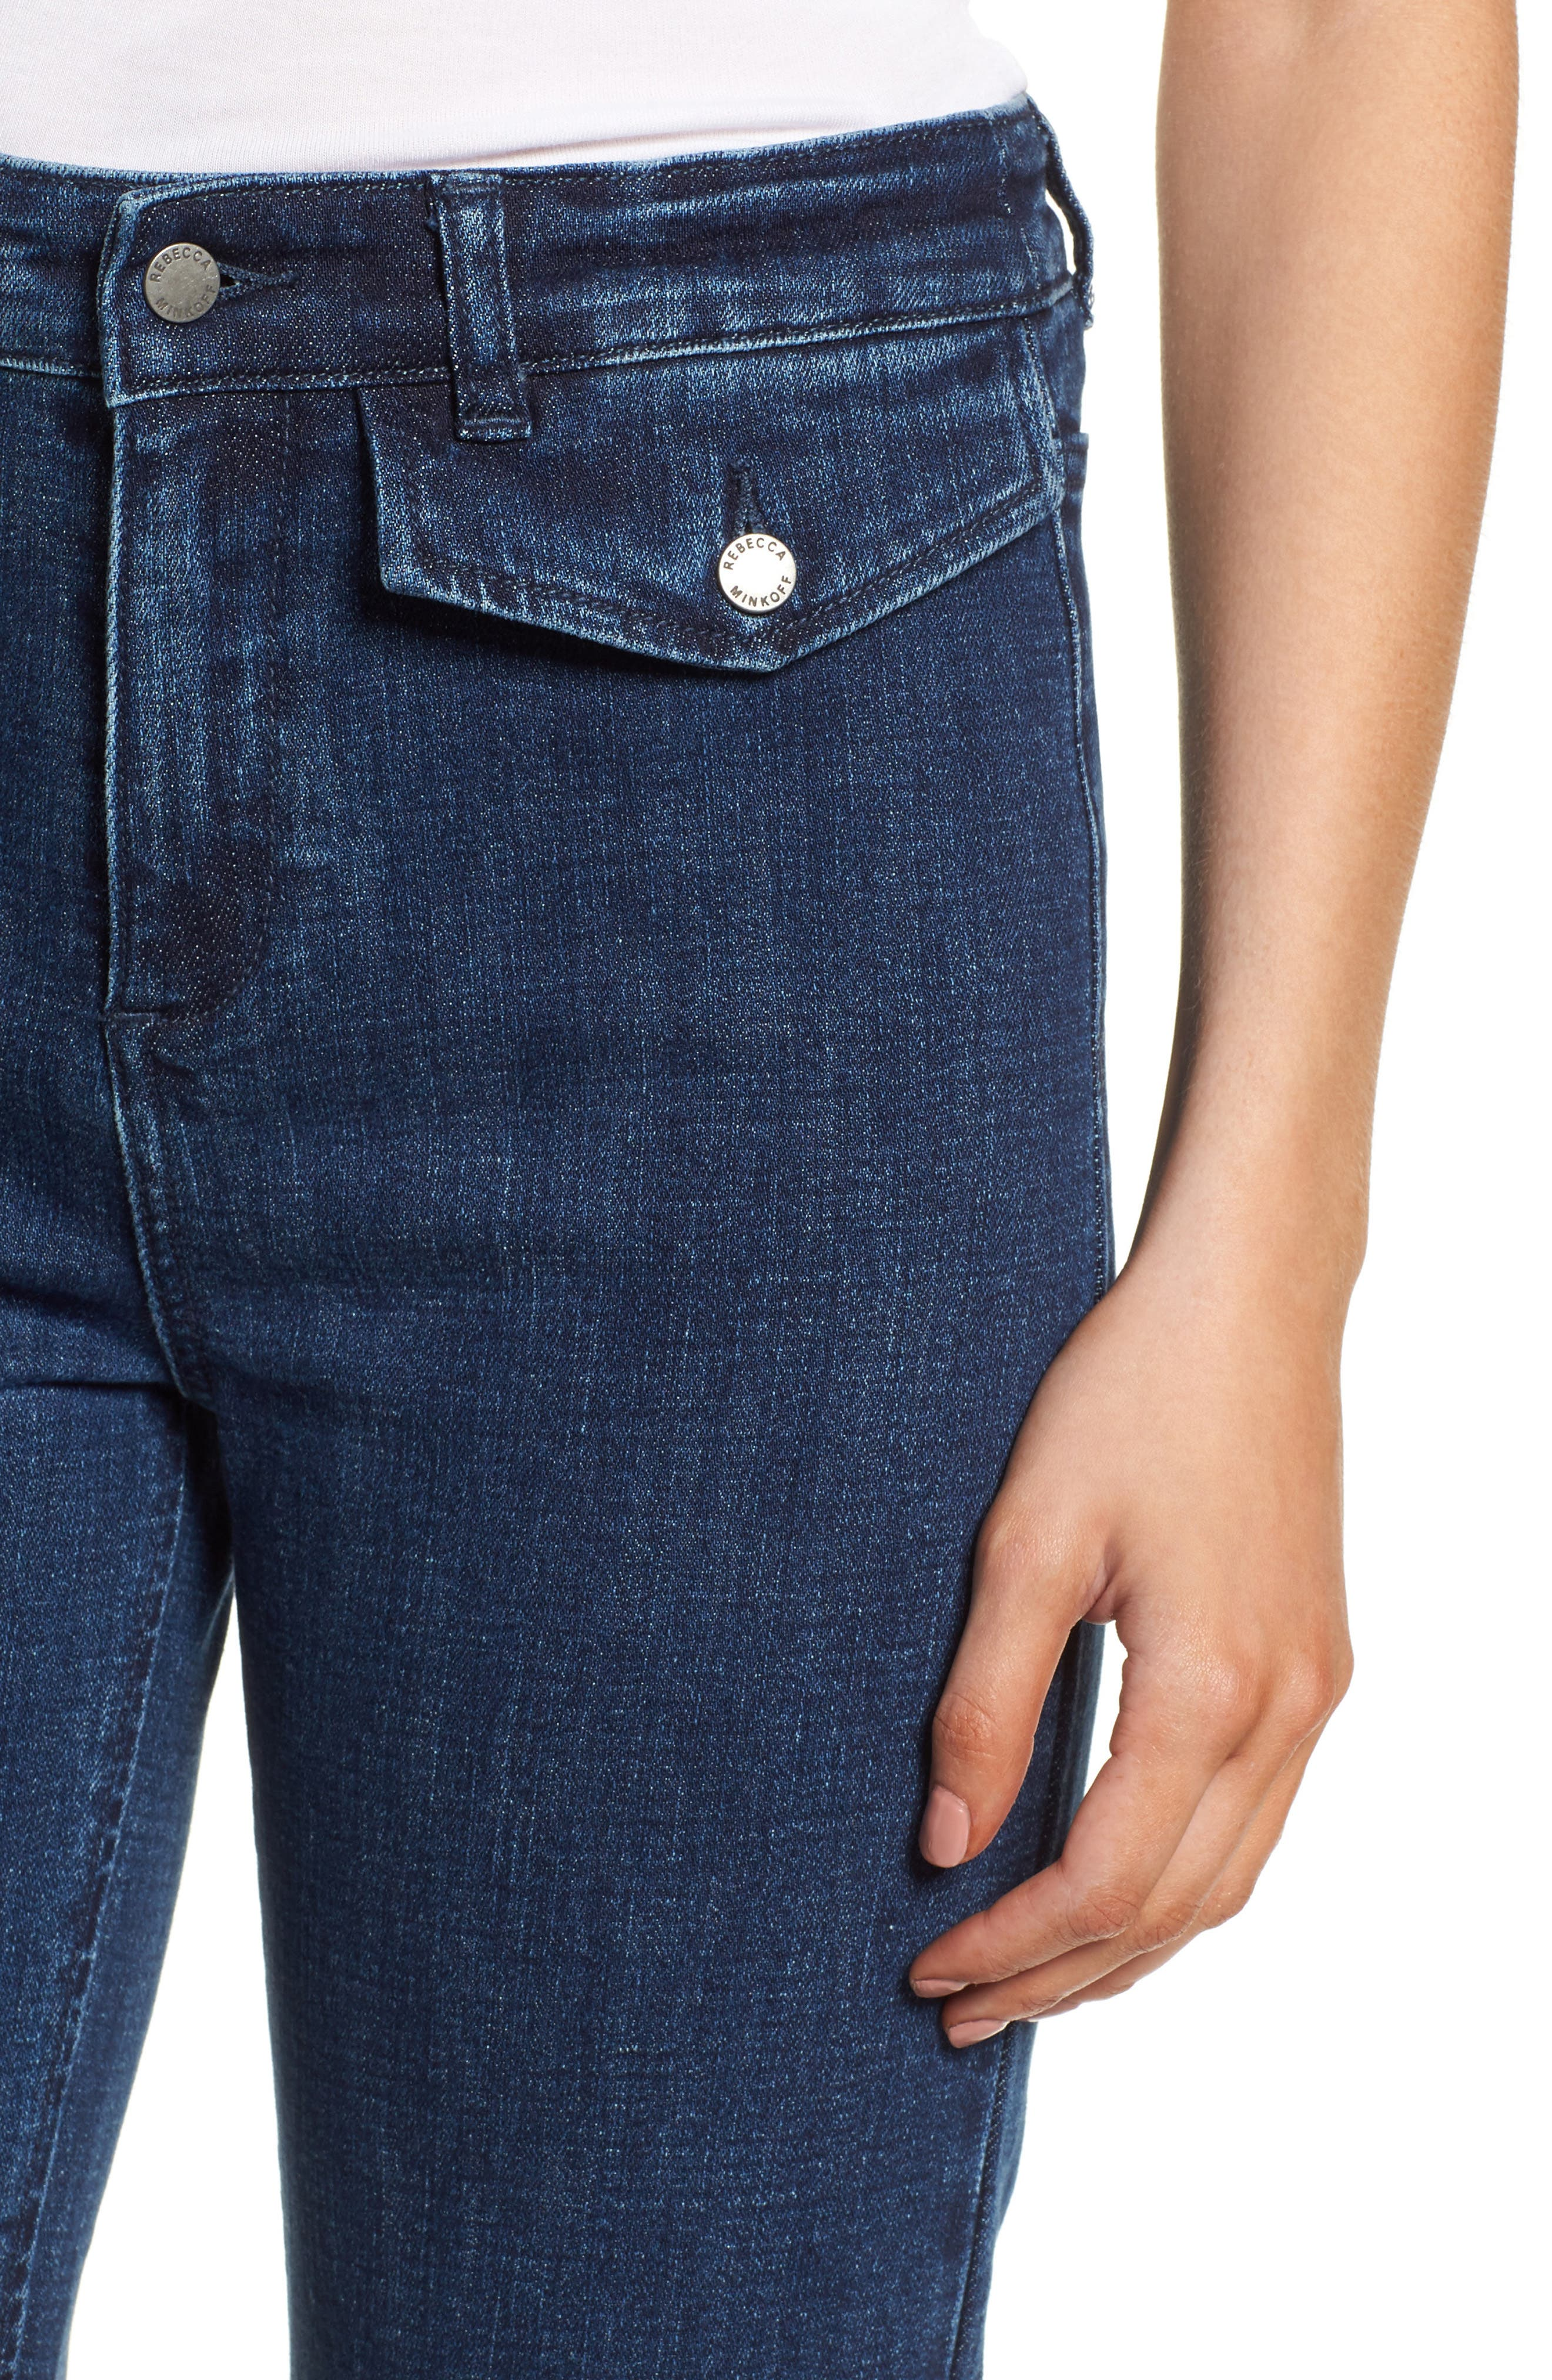 Elwood Wide Leg Jeans,                             Alternate thumbnail 4, color,                             INDIGO